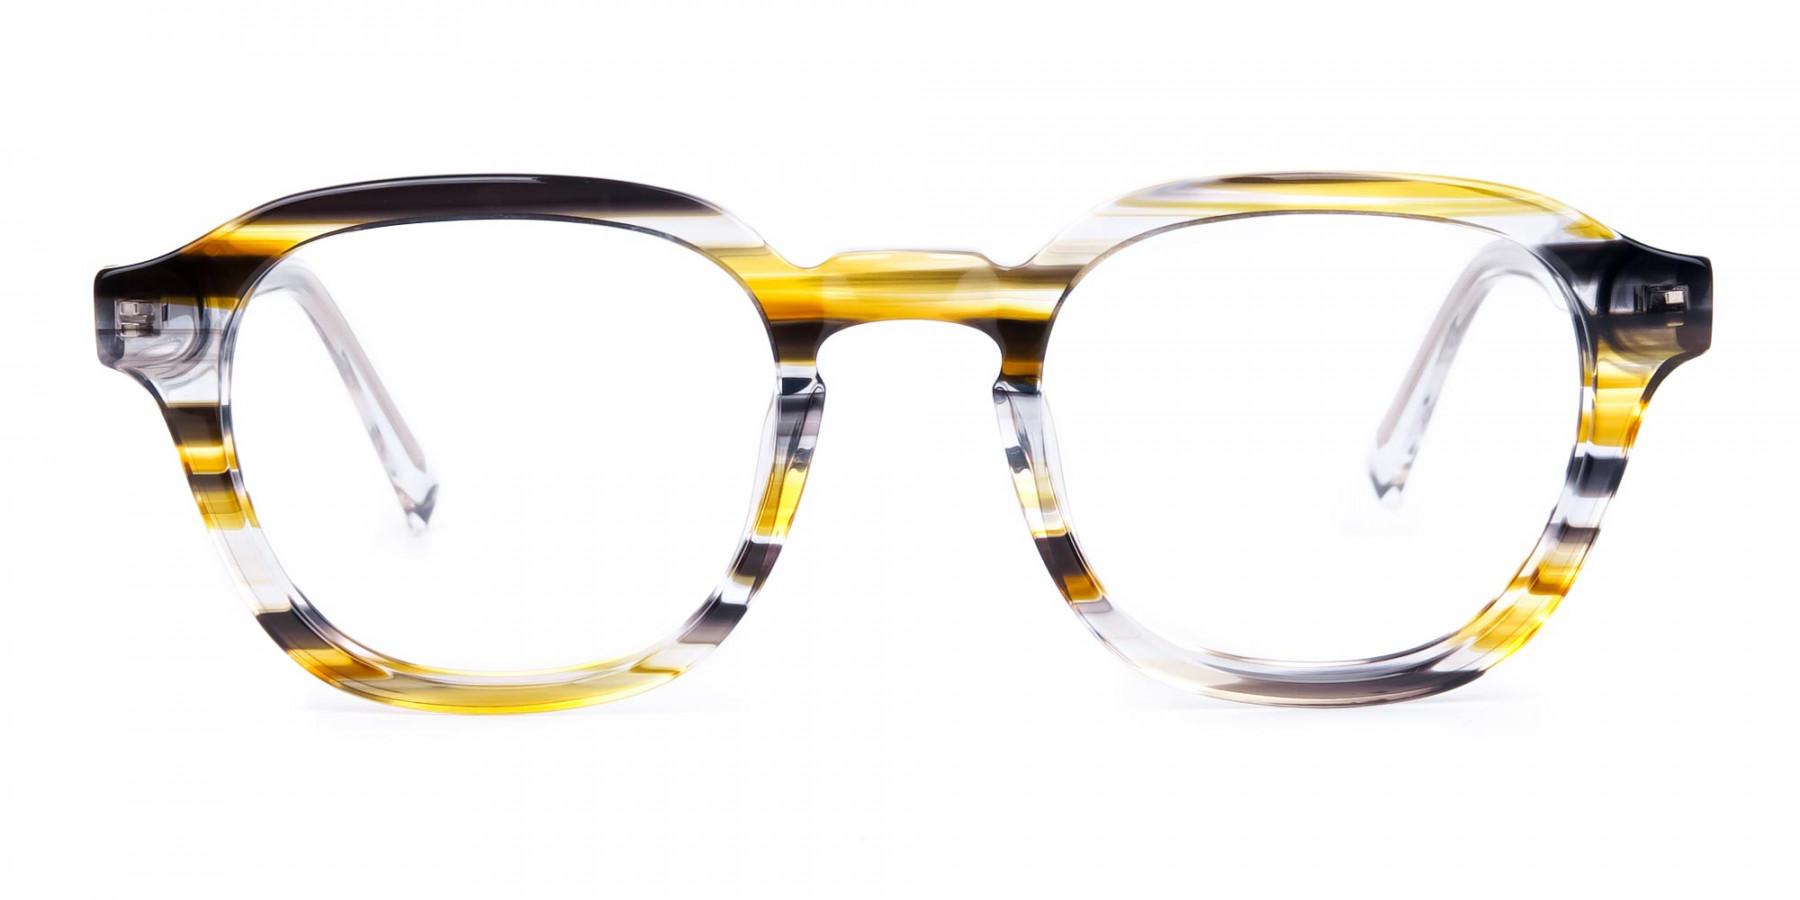 Black-Yellow-Crystal-Geometric-Glasses-1